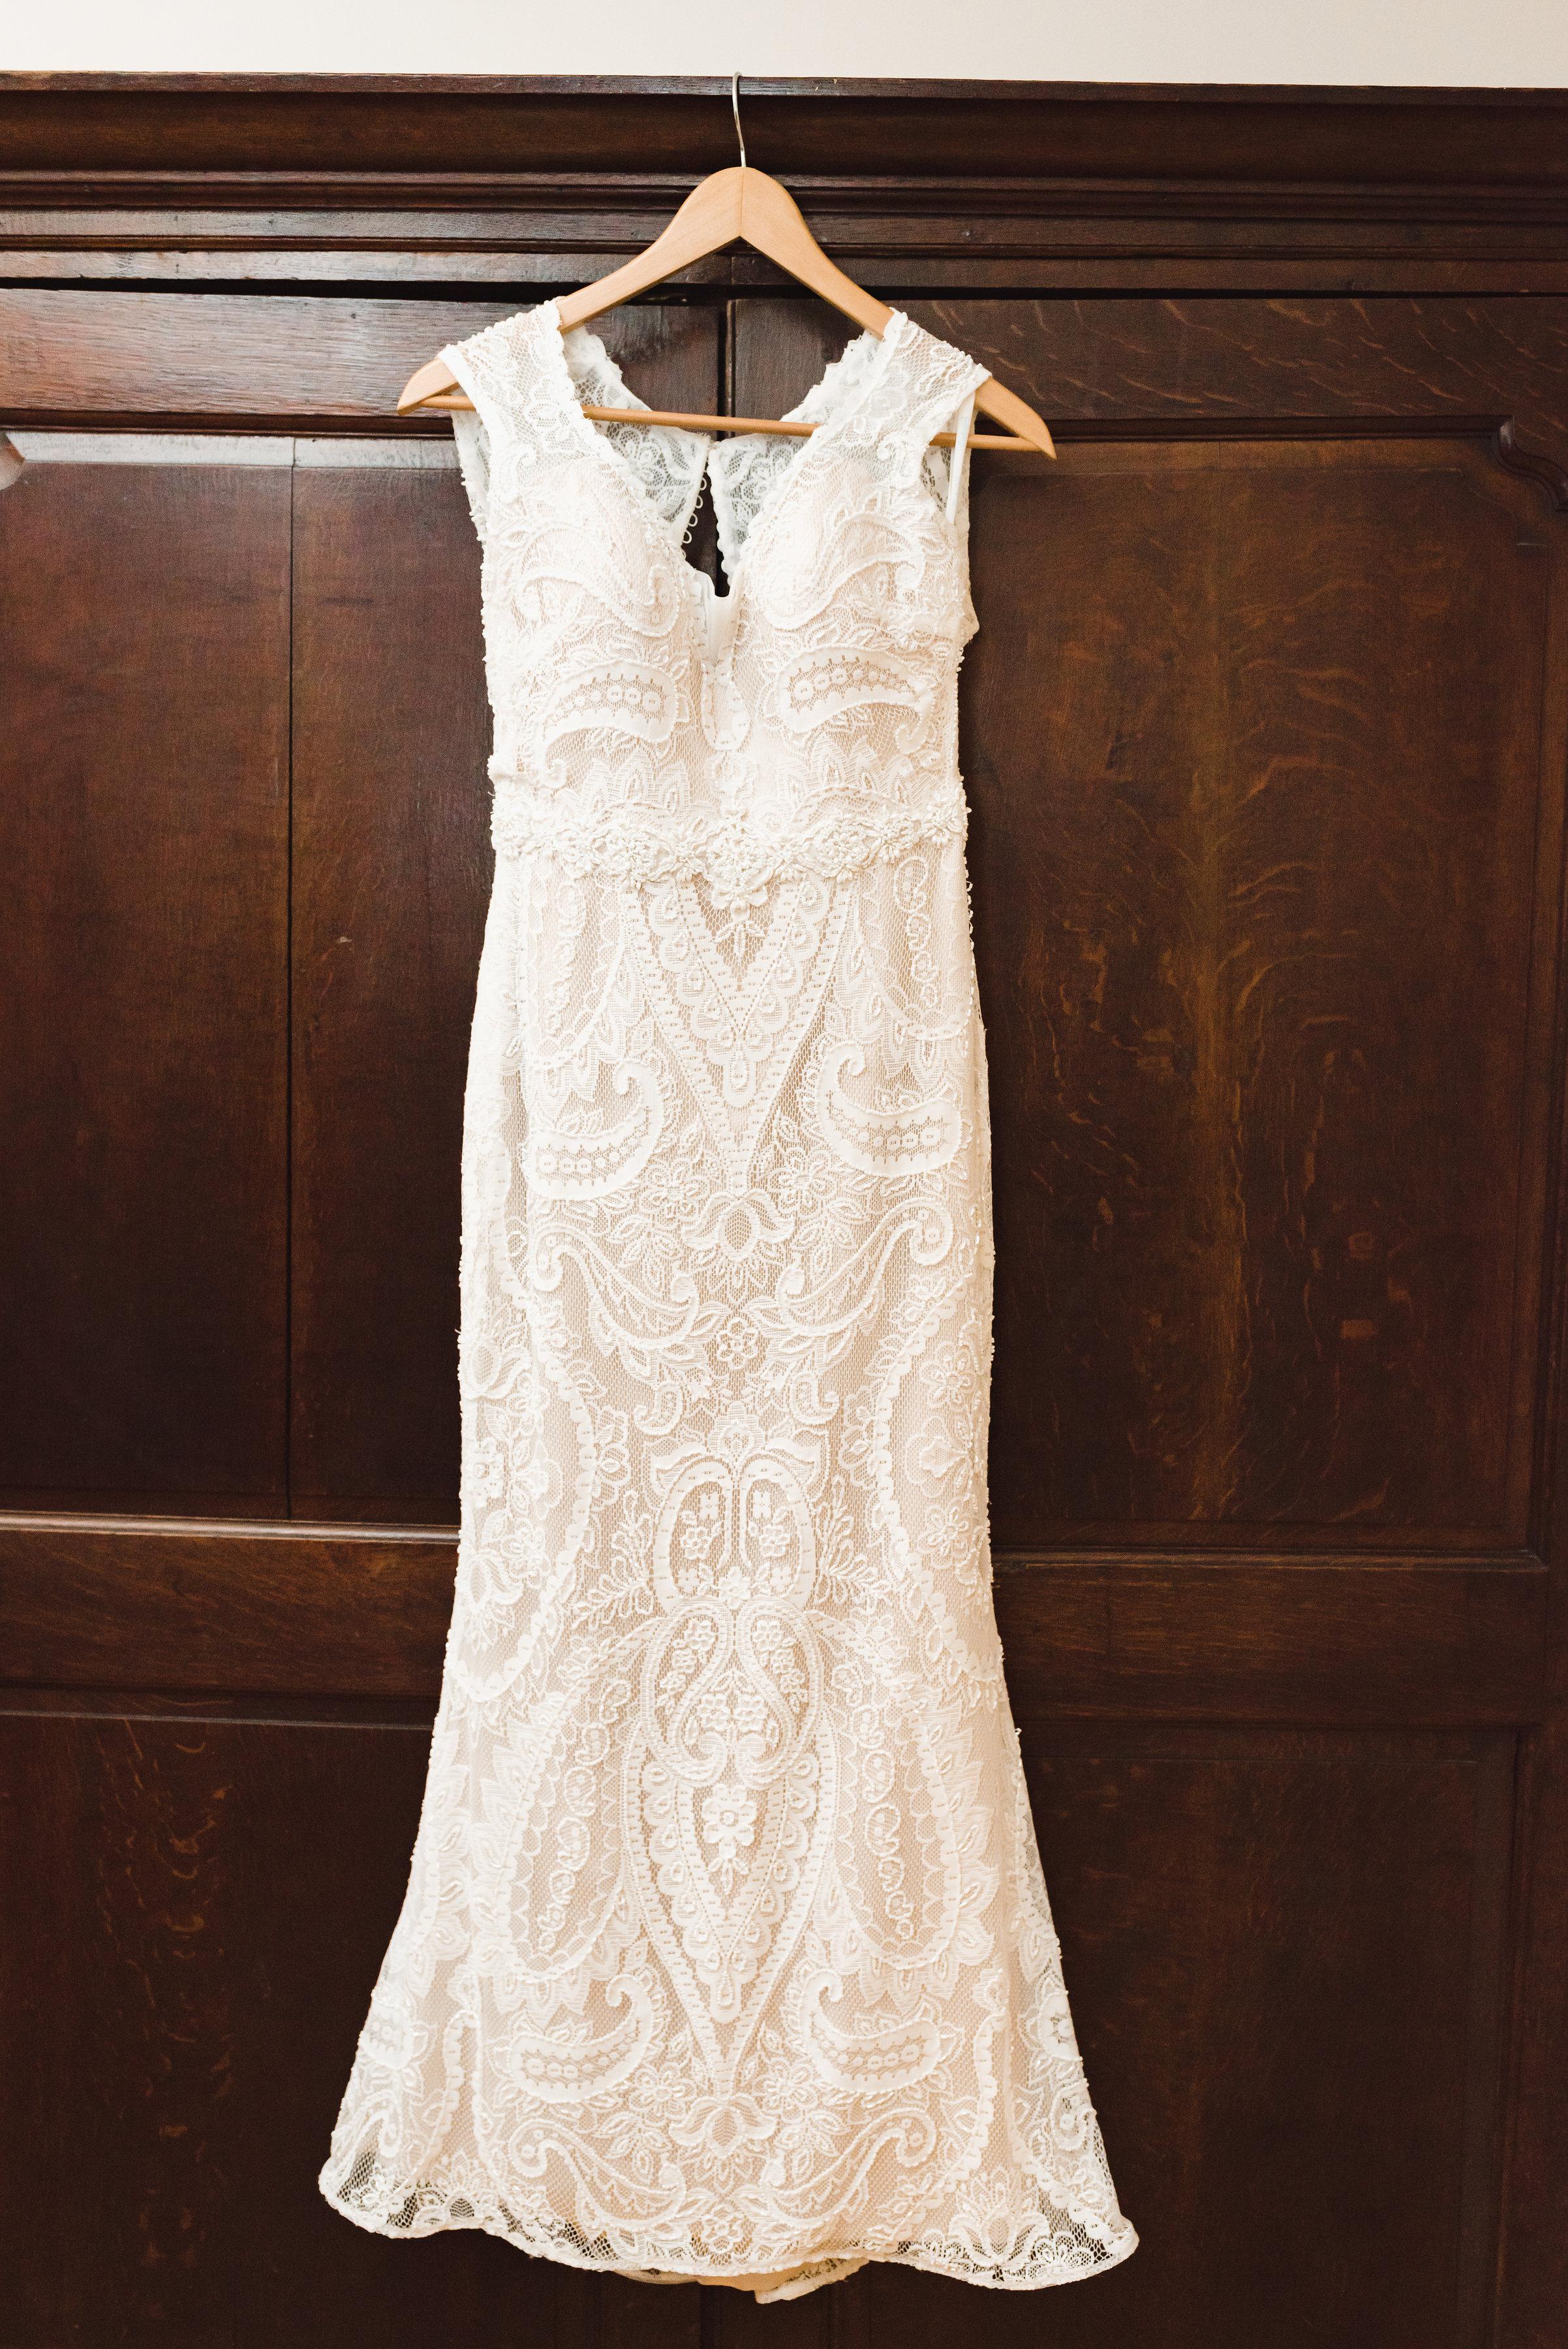 wedding dress hanging from closet Toronto wedding photographer